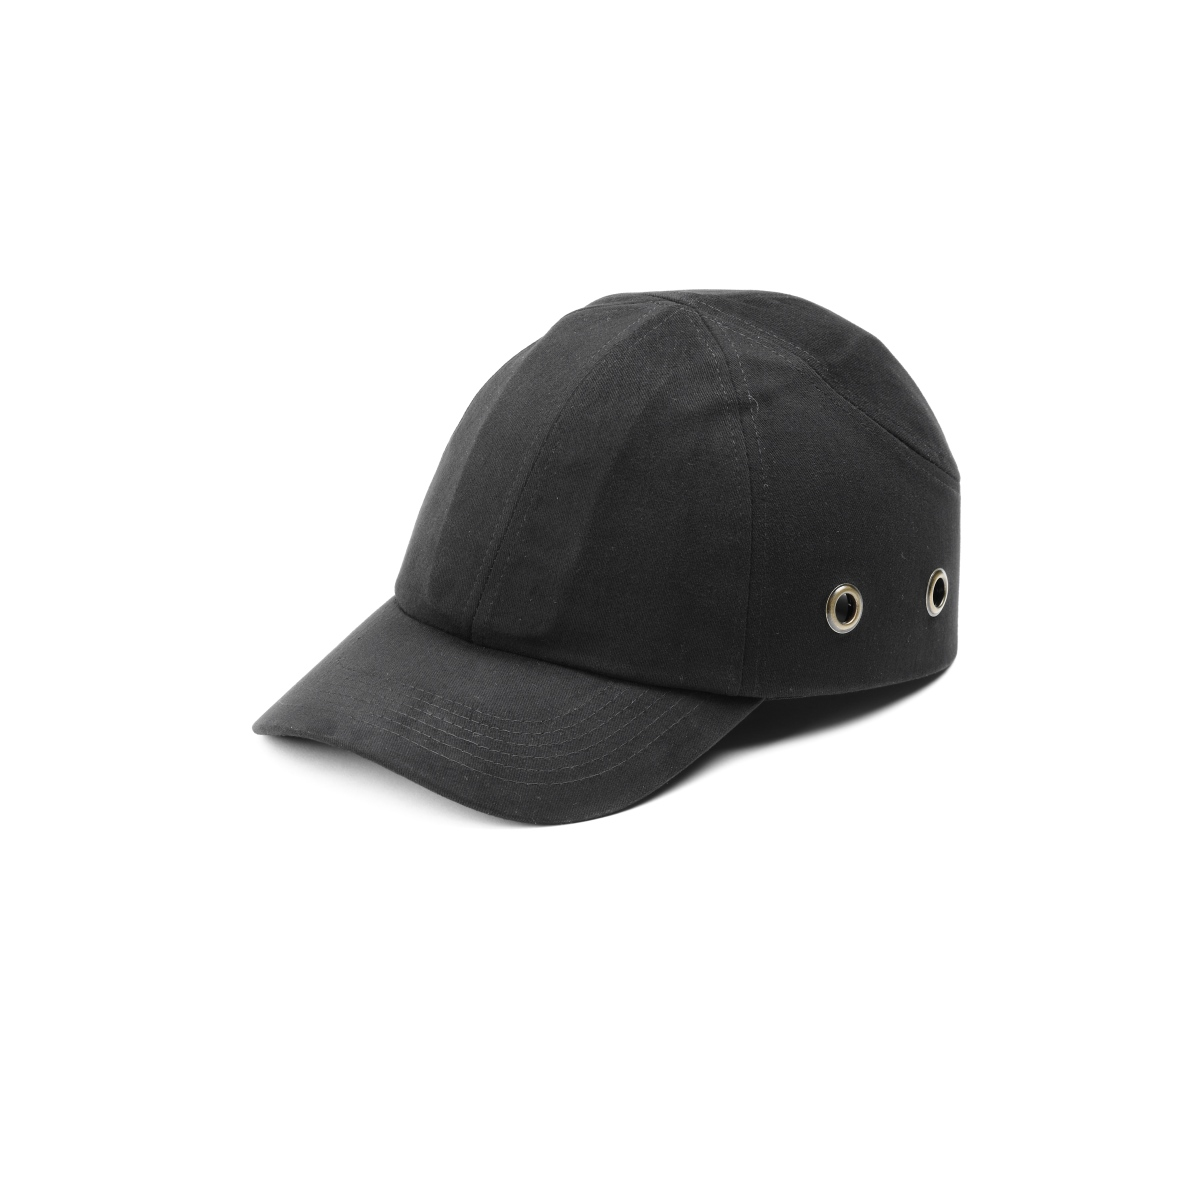 Baseball Style Bump Cap